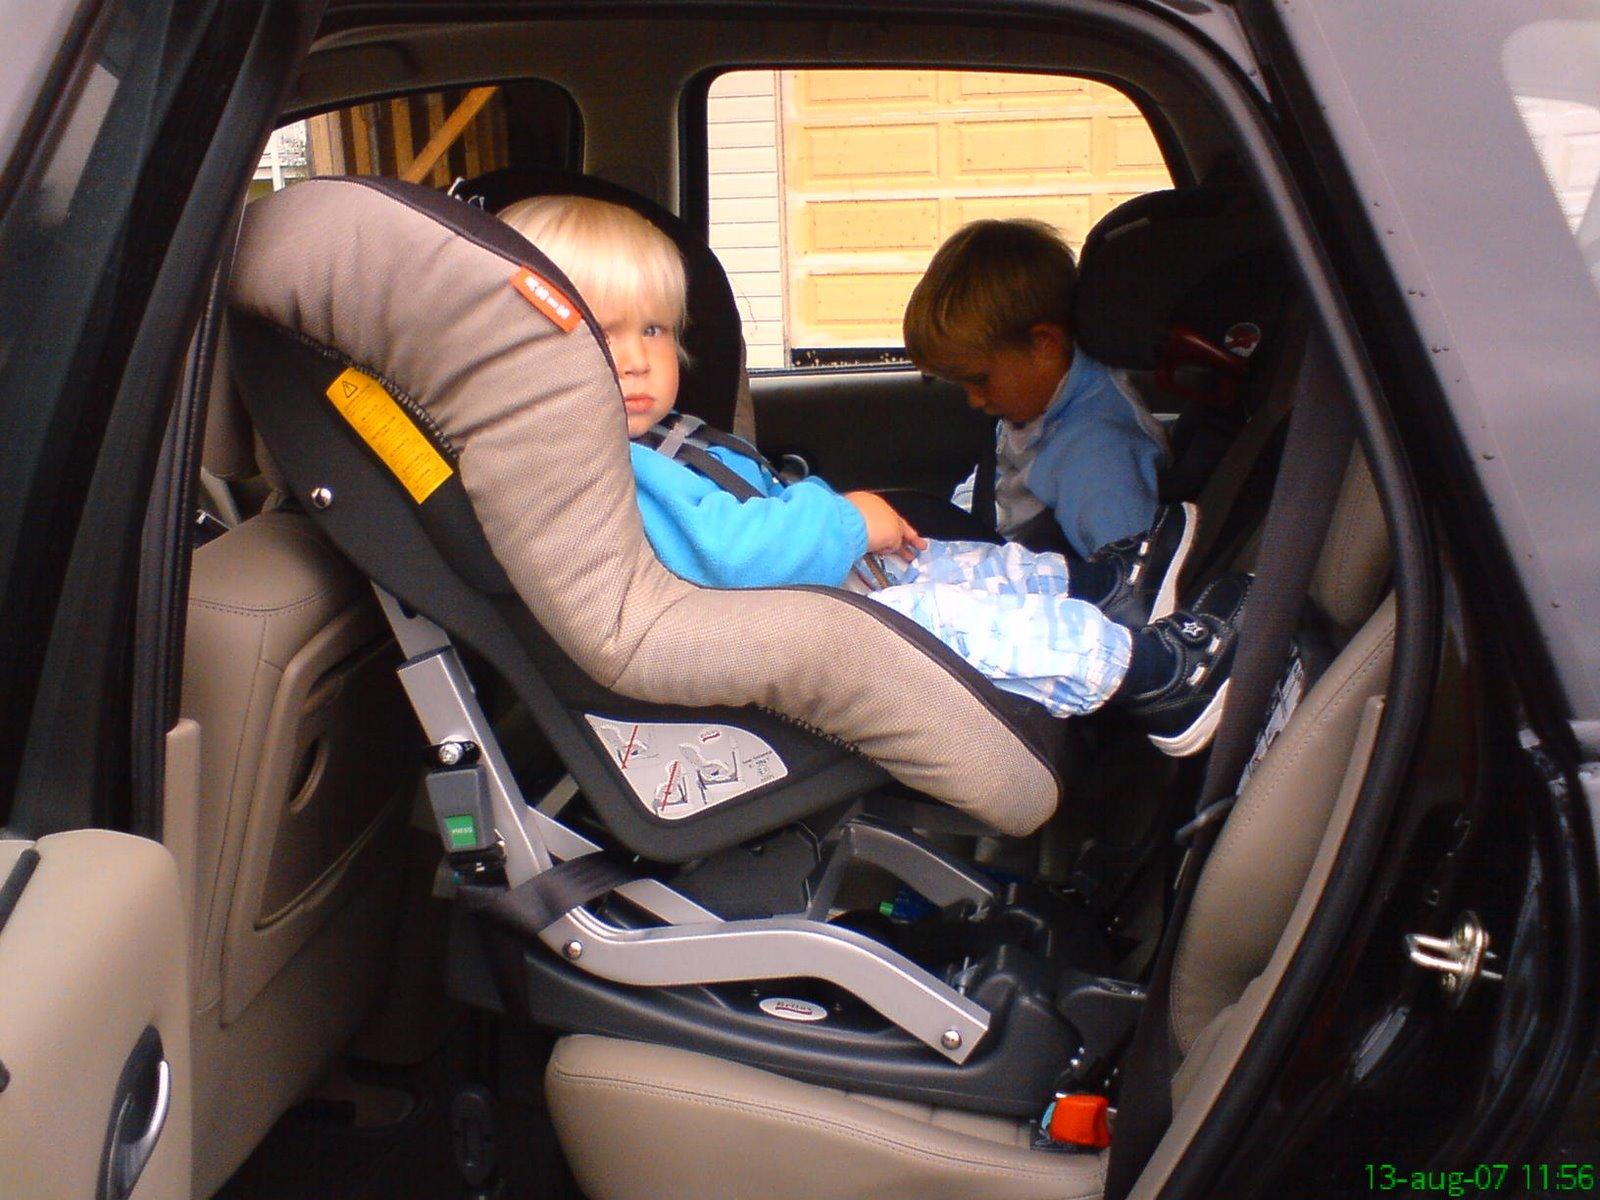 brio primo bilstol test